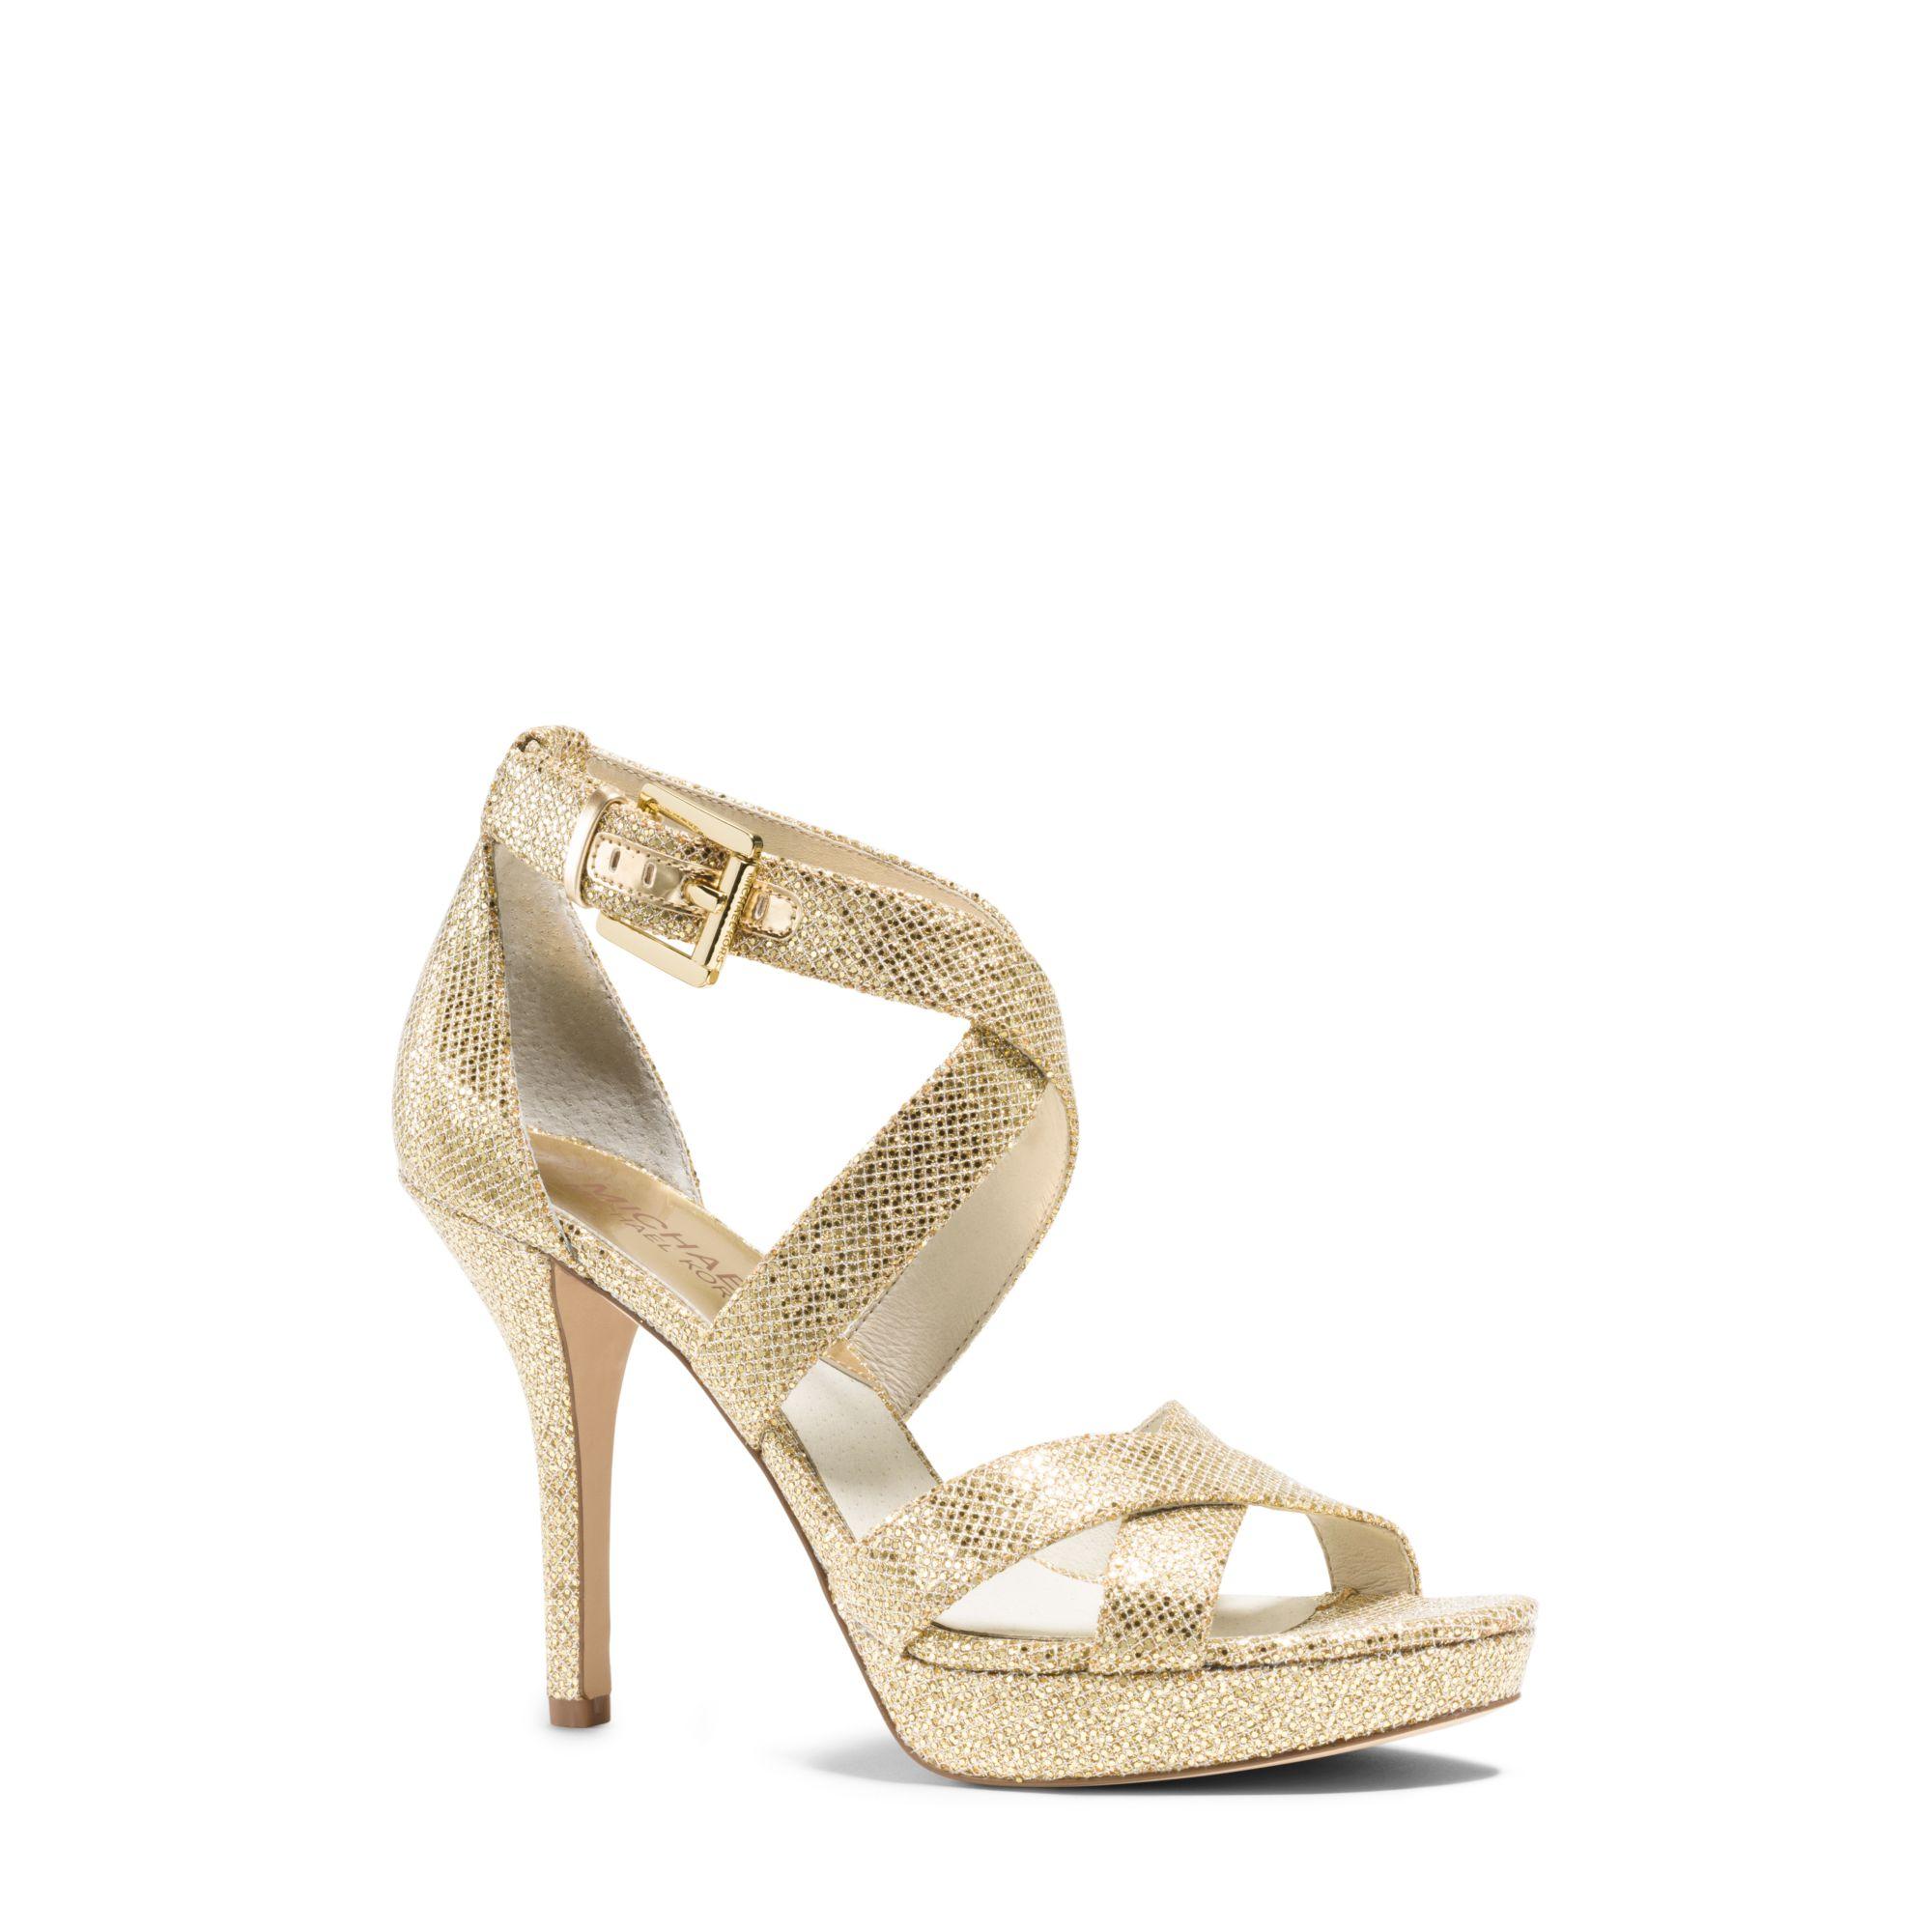 dda48224f91 Lyst - Michael Kors Evie Glitter Platform Sandal in Metallic